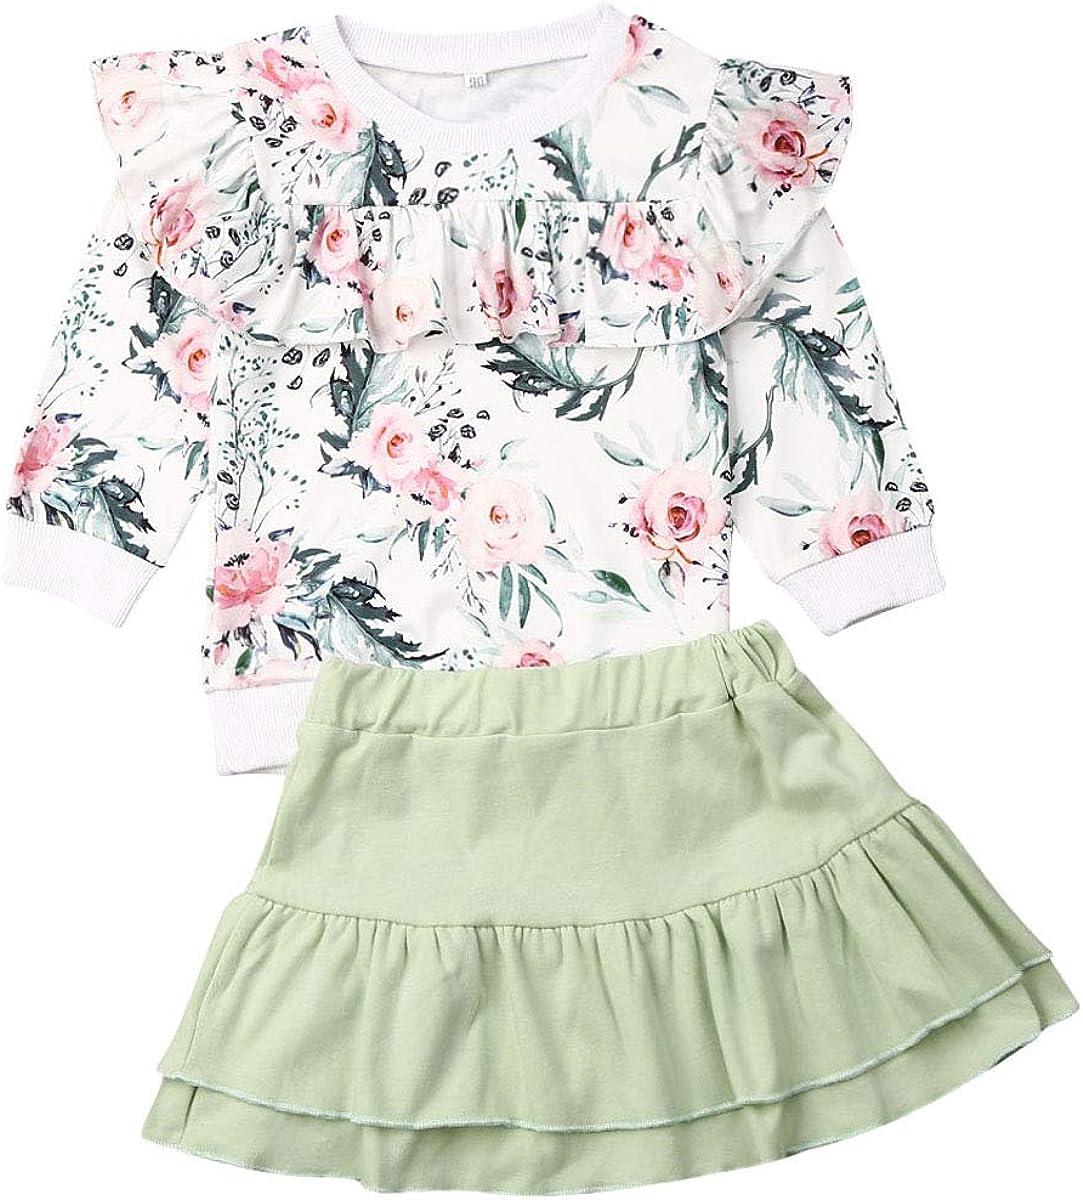 ruffled top girl tee Girl knit top toddler top striped shirt jillyatlanta girl clothing summer shirt